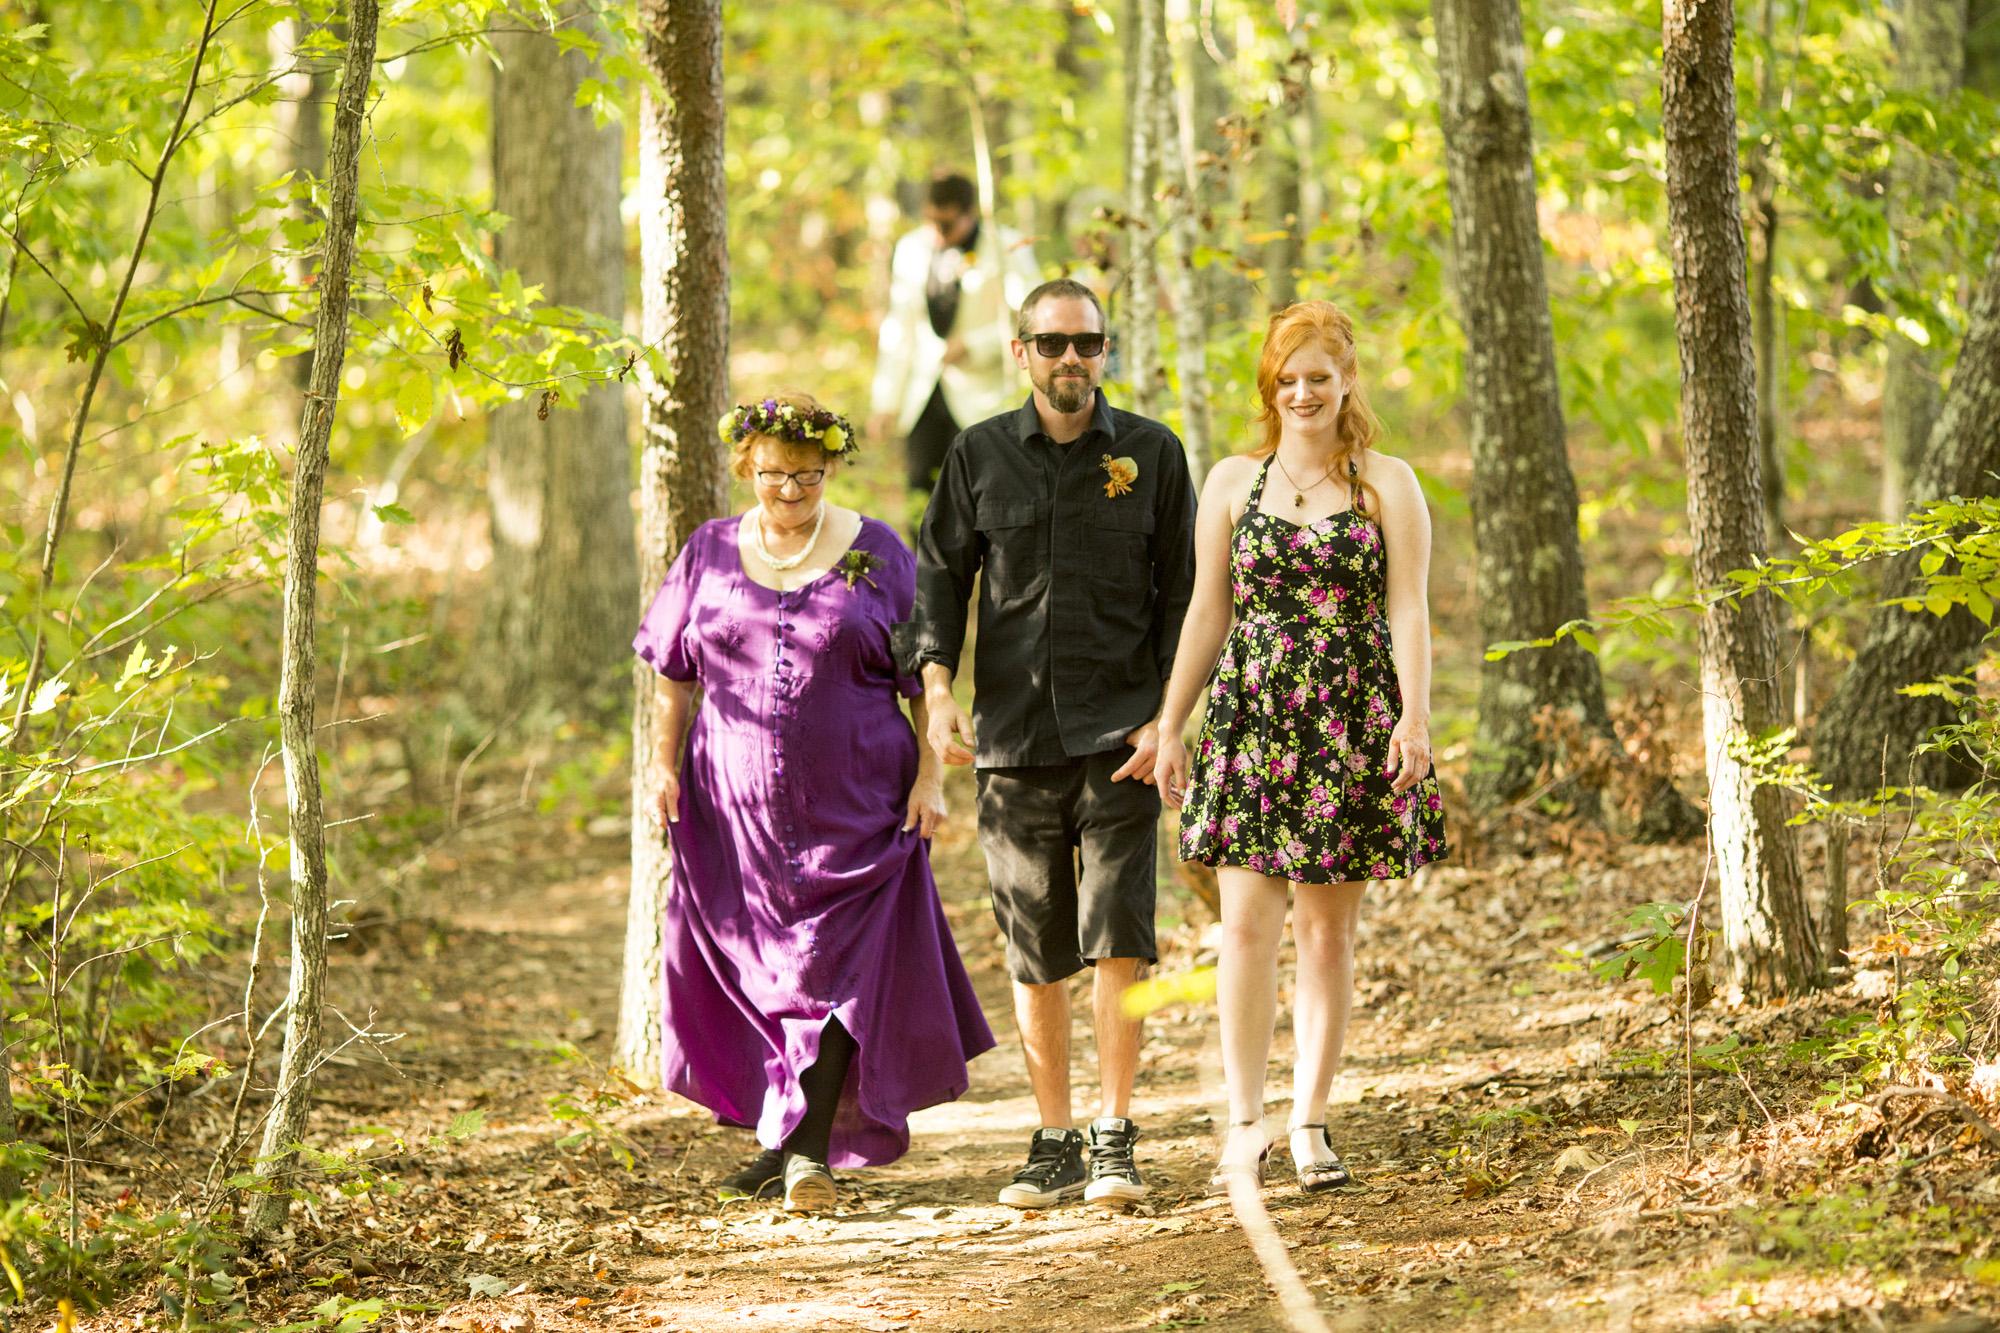 Seriously_Sabrina_Photography_Red_River_Gorge_Kentucky_Wedding_ShawnDana108.jpg